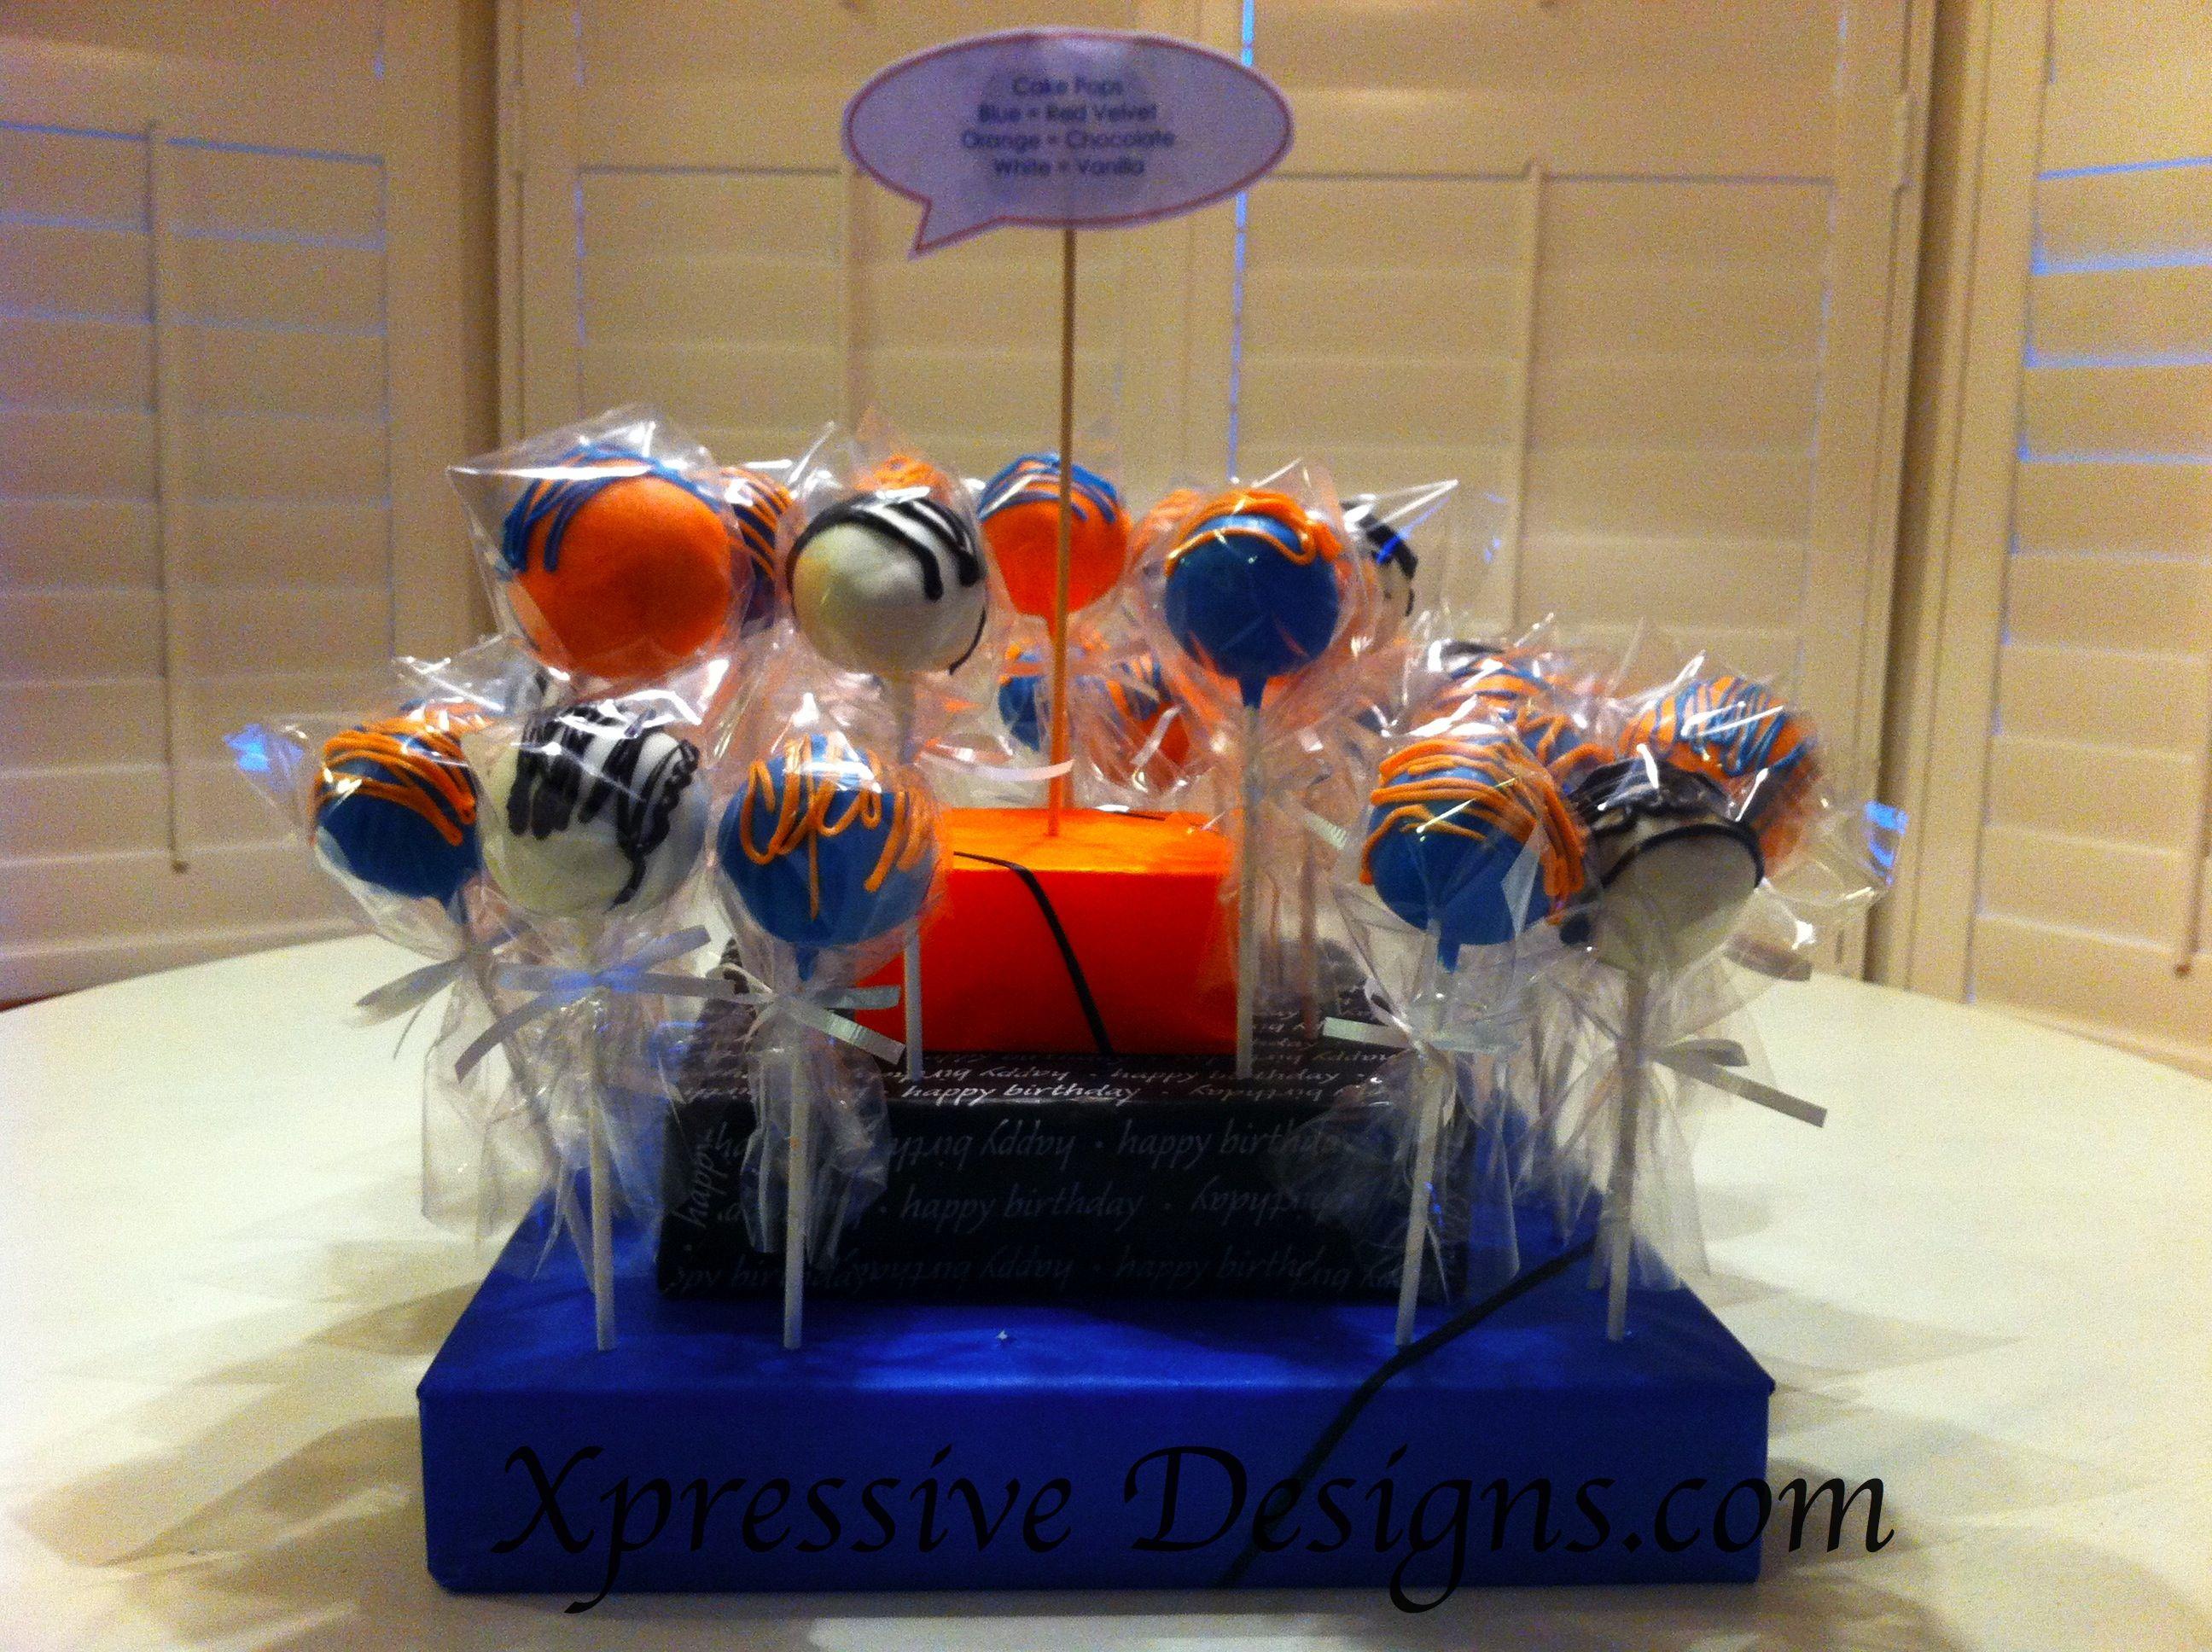 Cake pop Bouquet for a 21st Birthday #cakepopbouquet